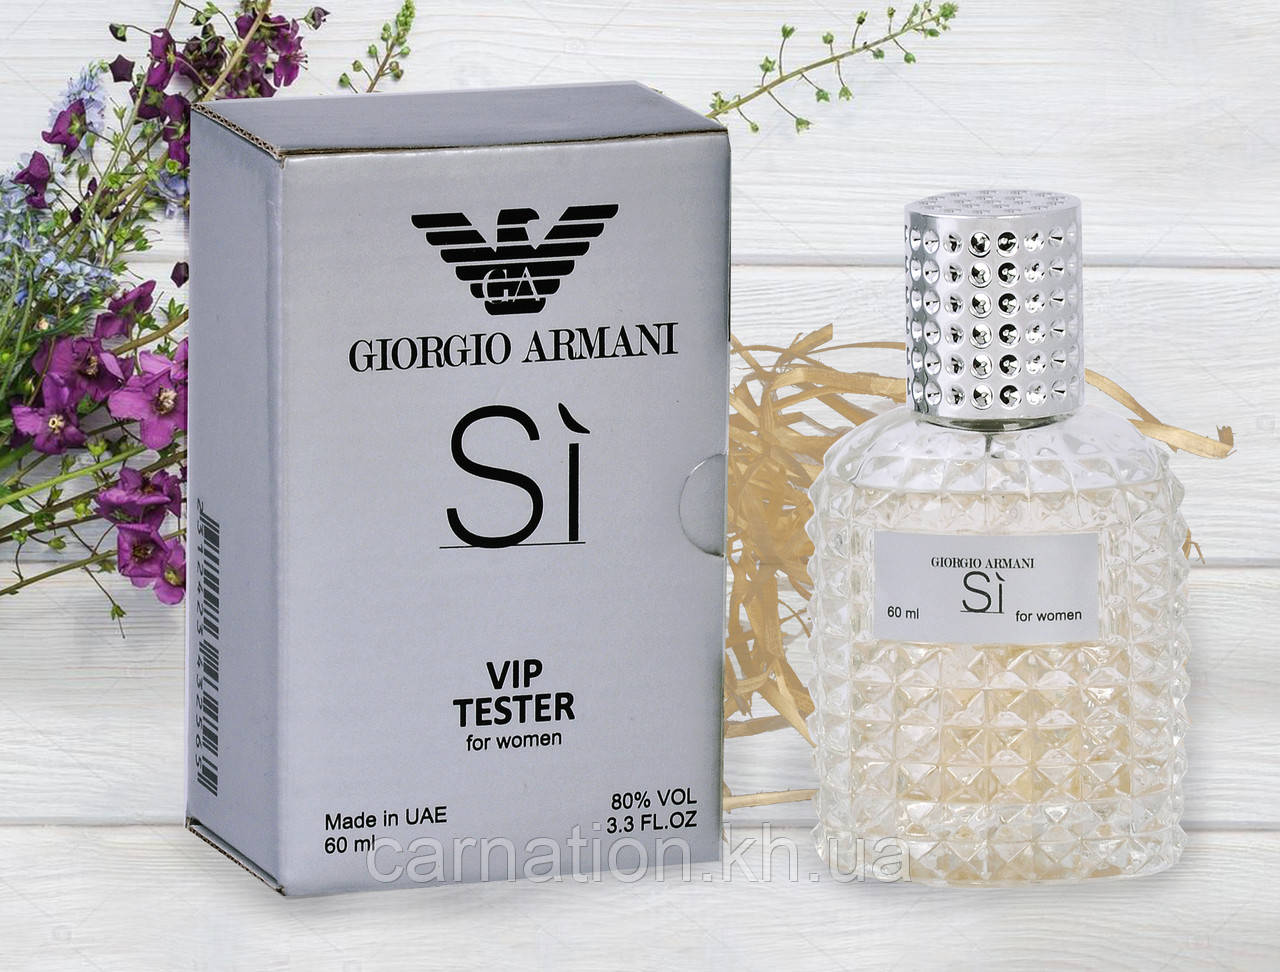 Женский тестер Giorgio Armani Si Vip (Джорджио Армани Си) 60 мл